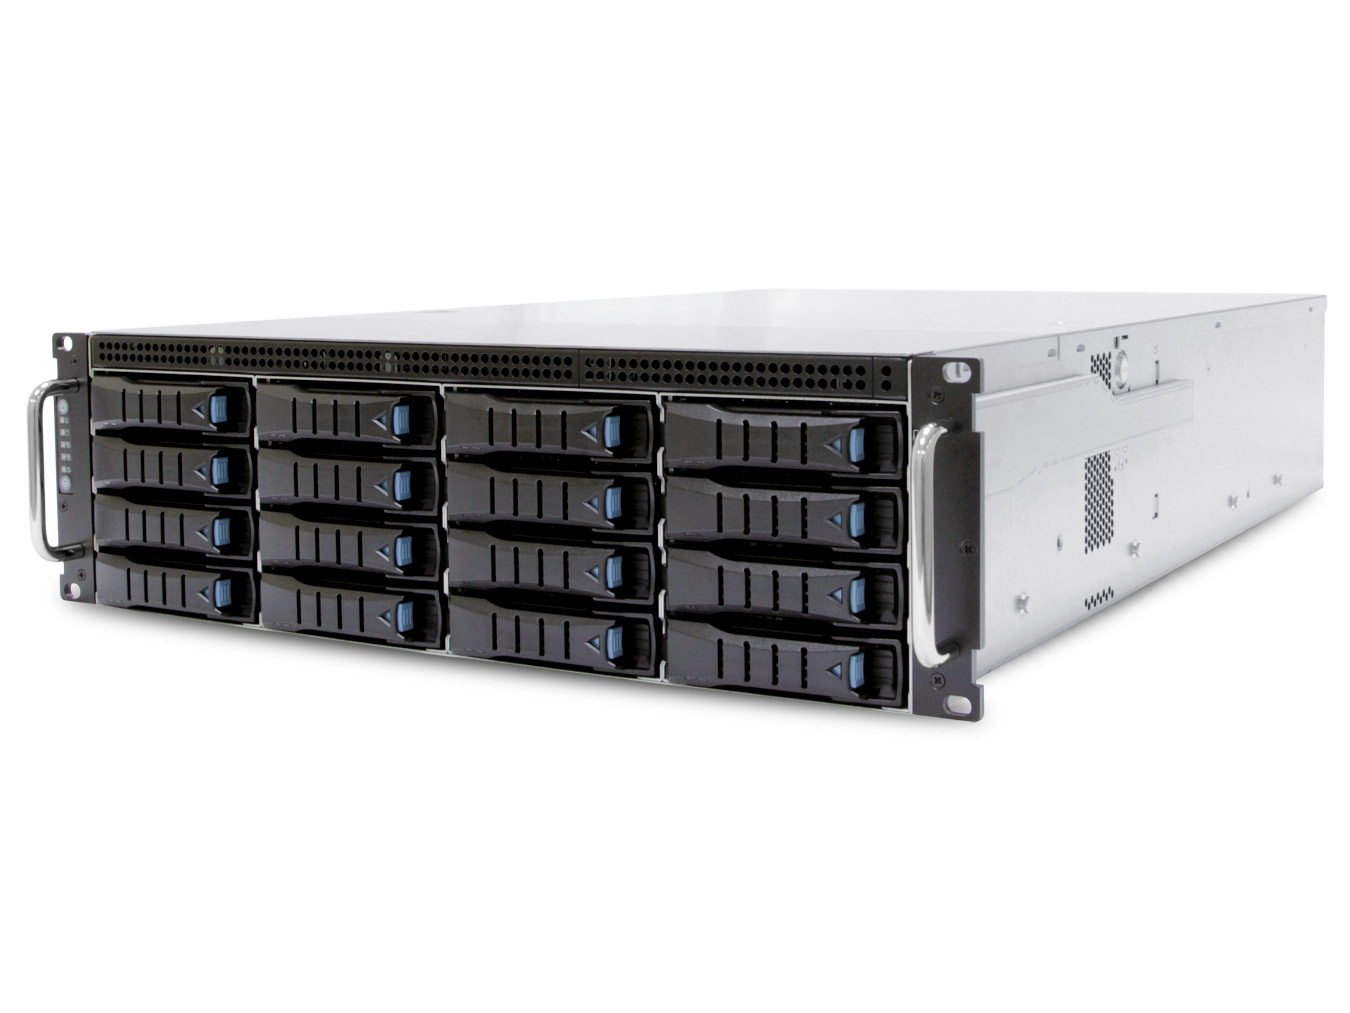 AIC SB302-VG XP1-S302VG01 3U 16-Bay Storage Server